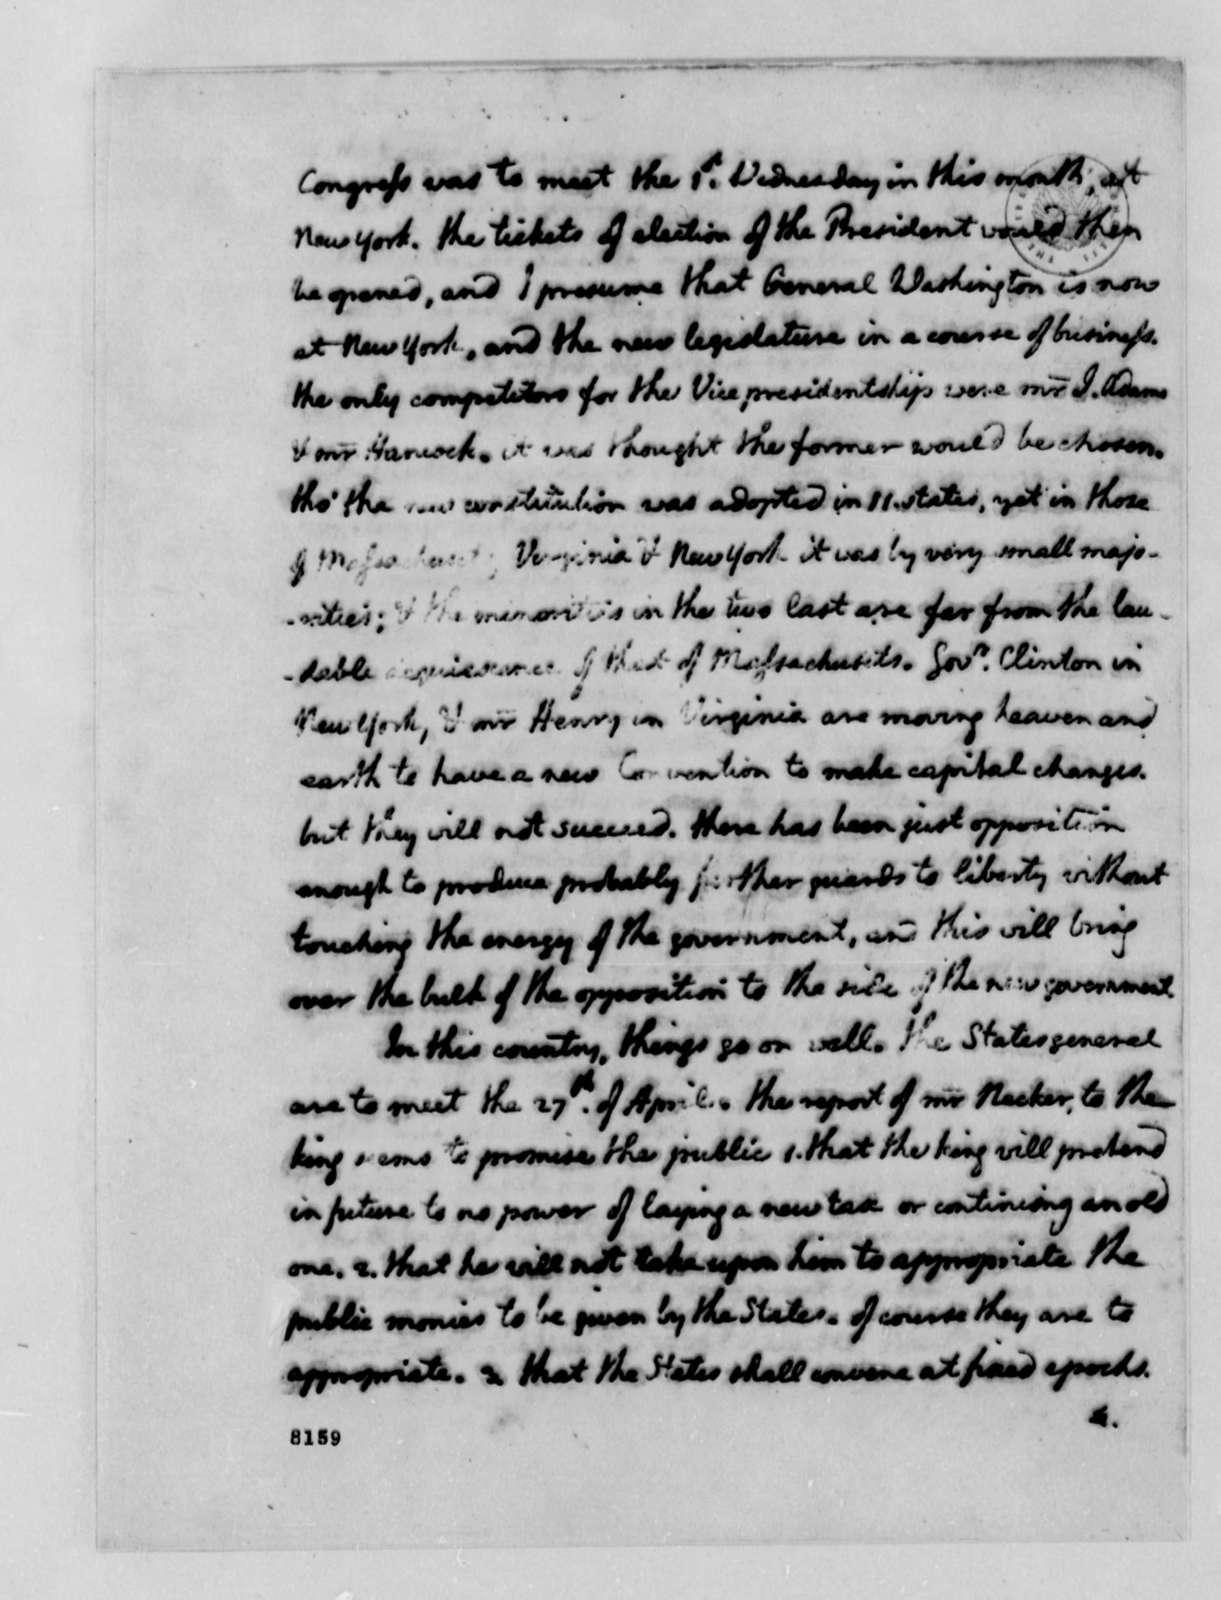 Thomas Jefferson to John Paul Jones, March 23, 1789